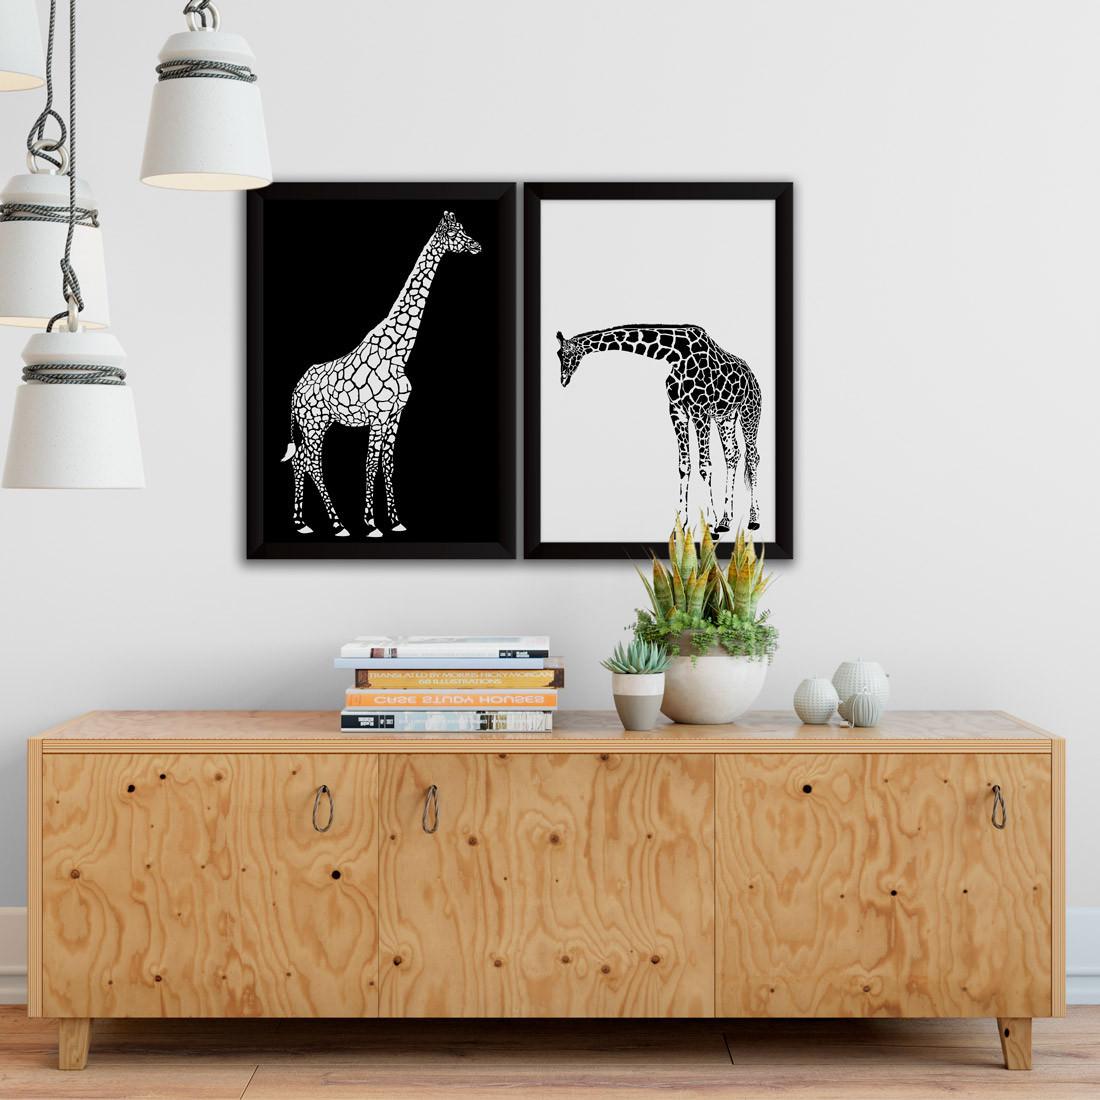 Conjunto de Quadros Decorativos Girafas Preto e Branco